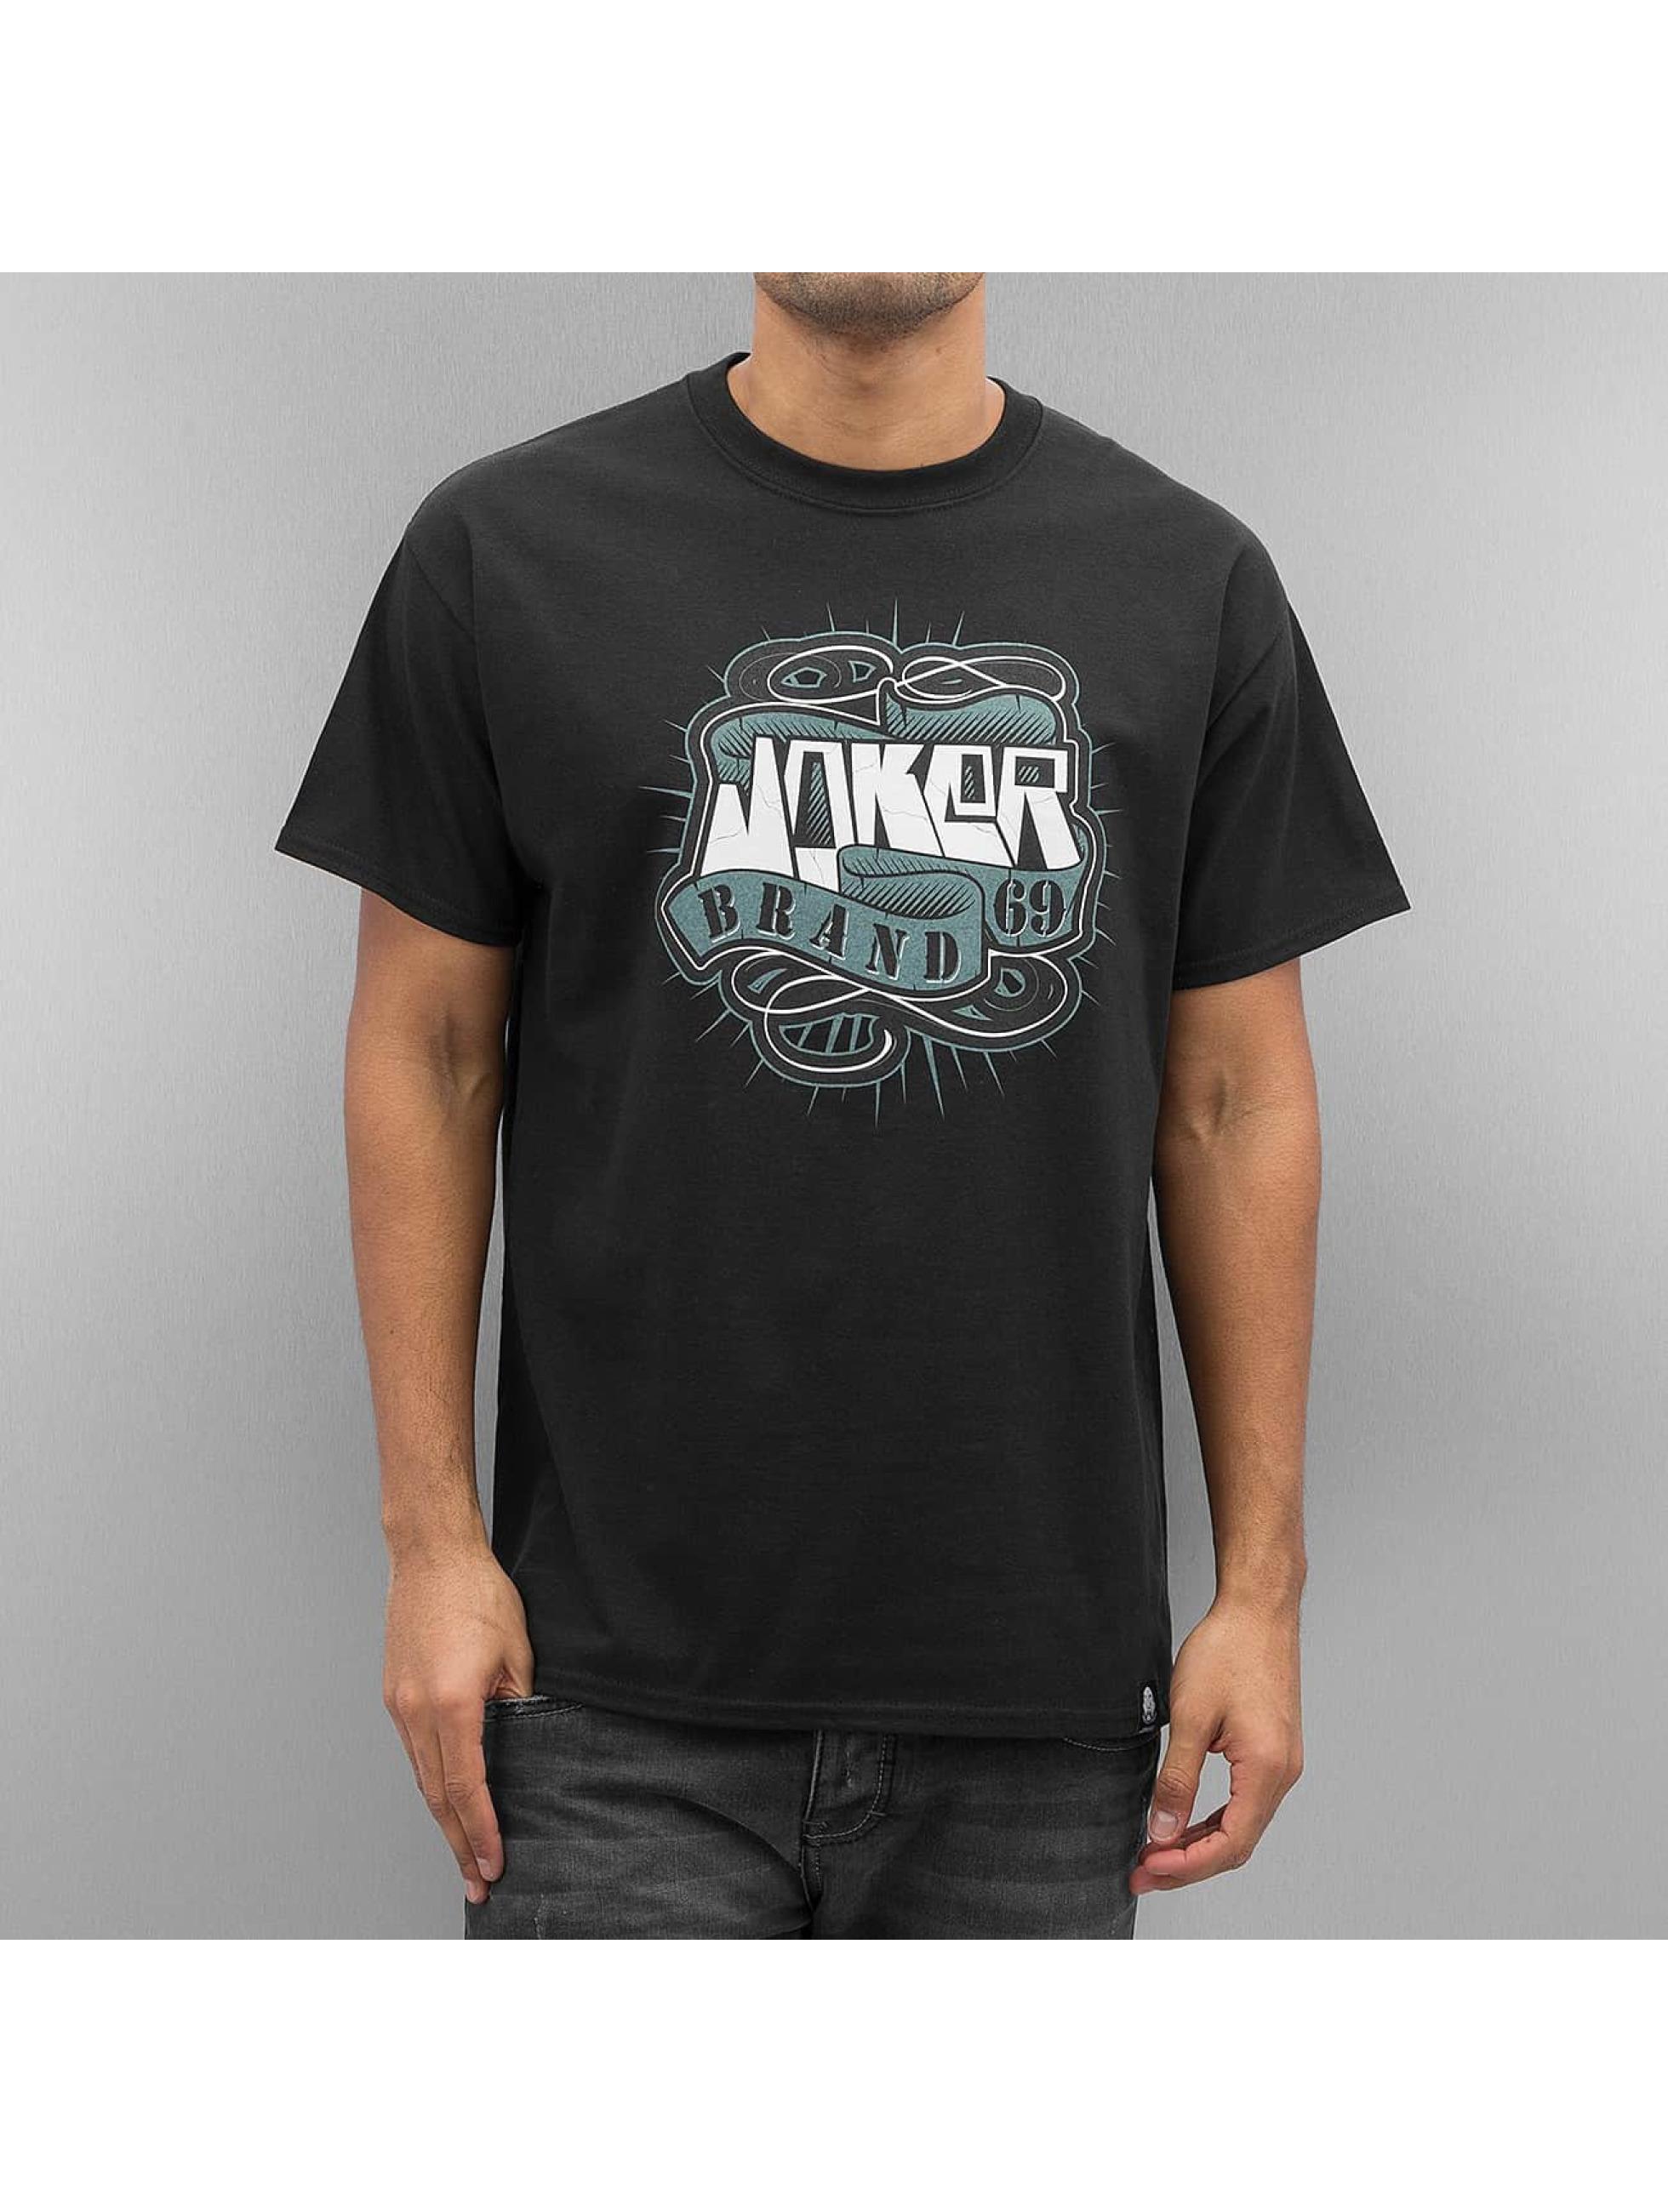 Joker Männer T-Shirt 69 Brand in schwarz